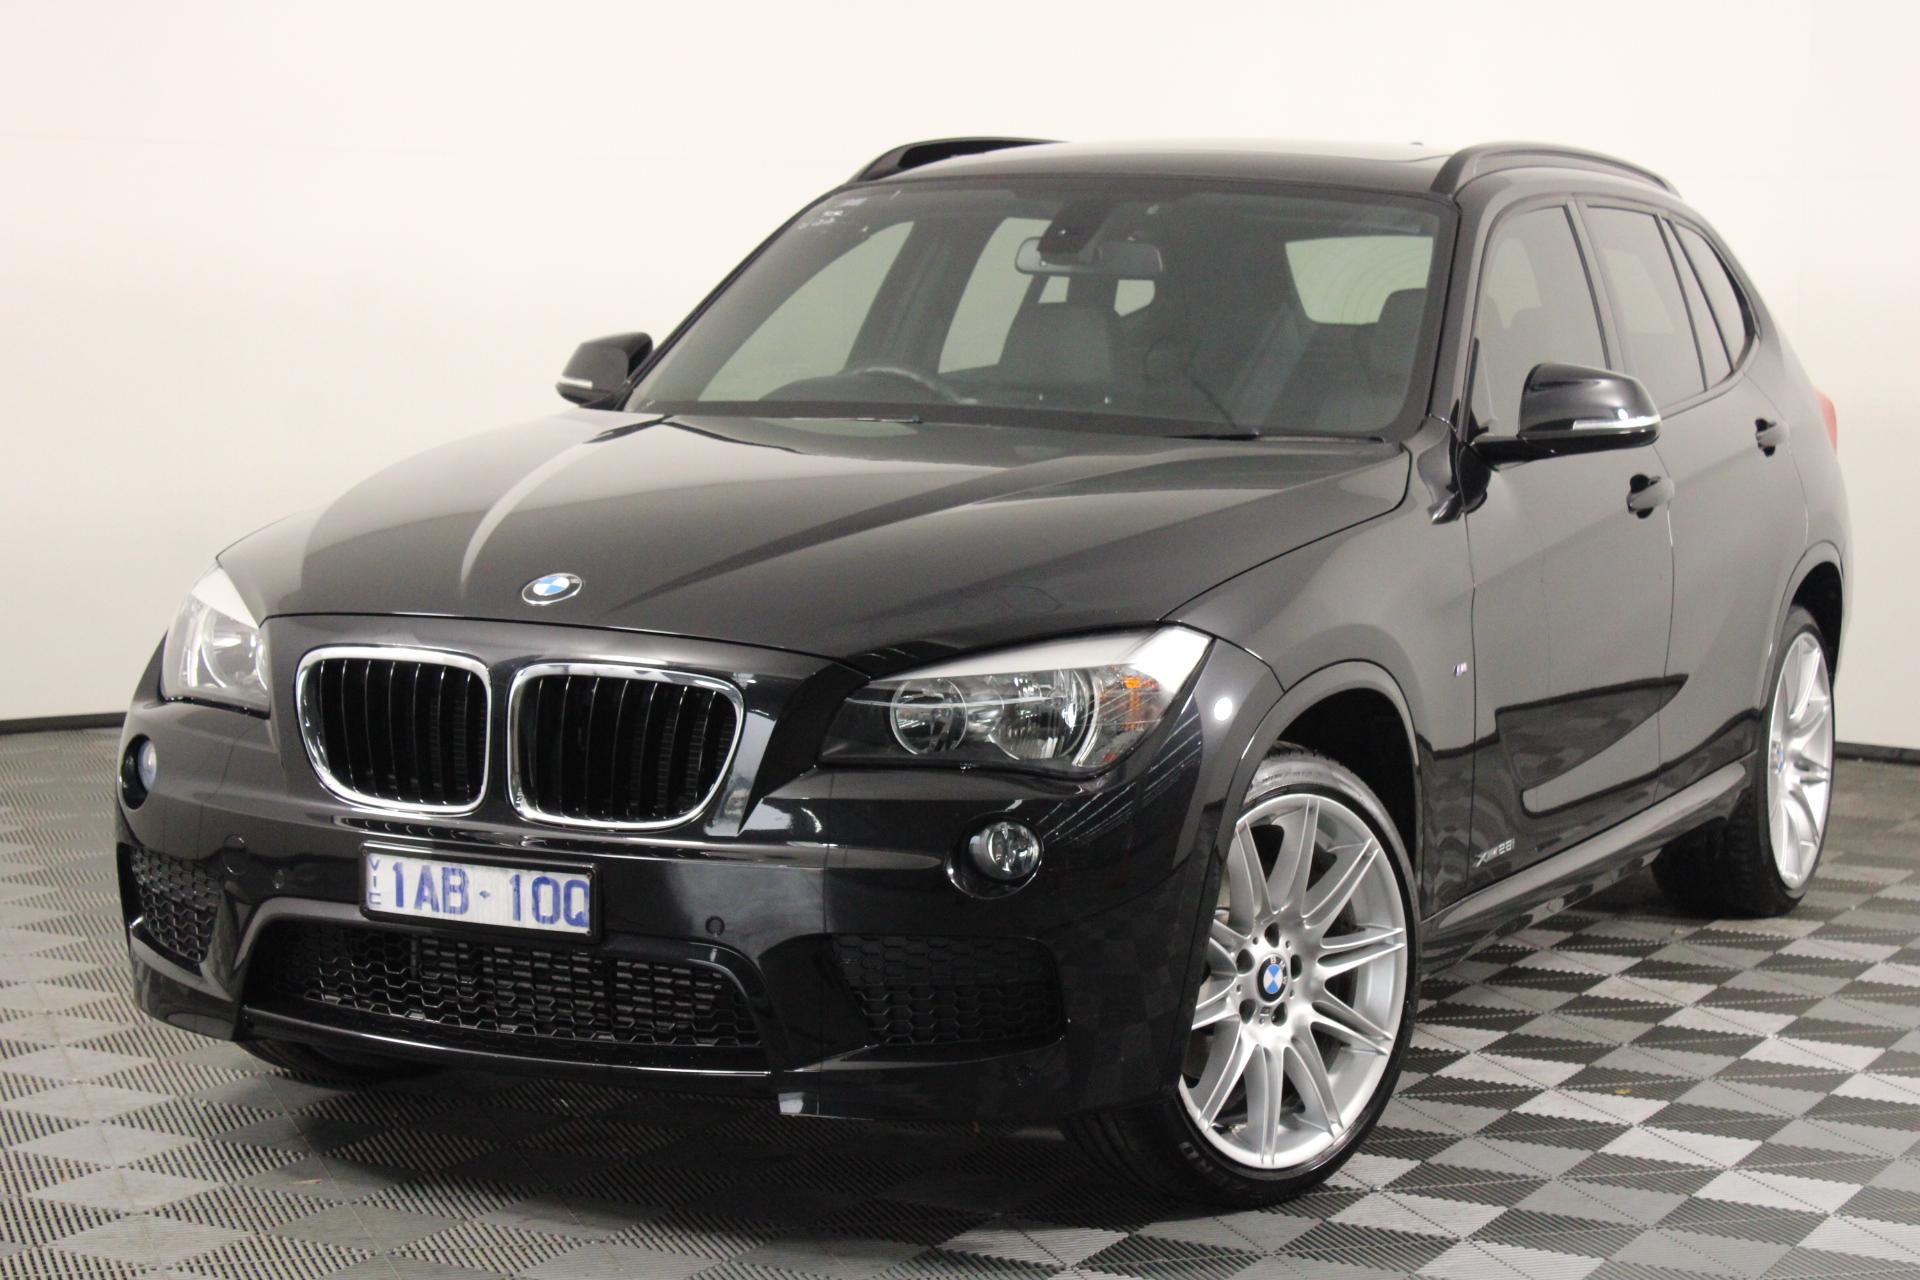 2013 BMW X1 xDrive 28i E84 LCI Automatic - 8 Speed Wagon